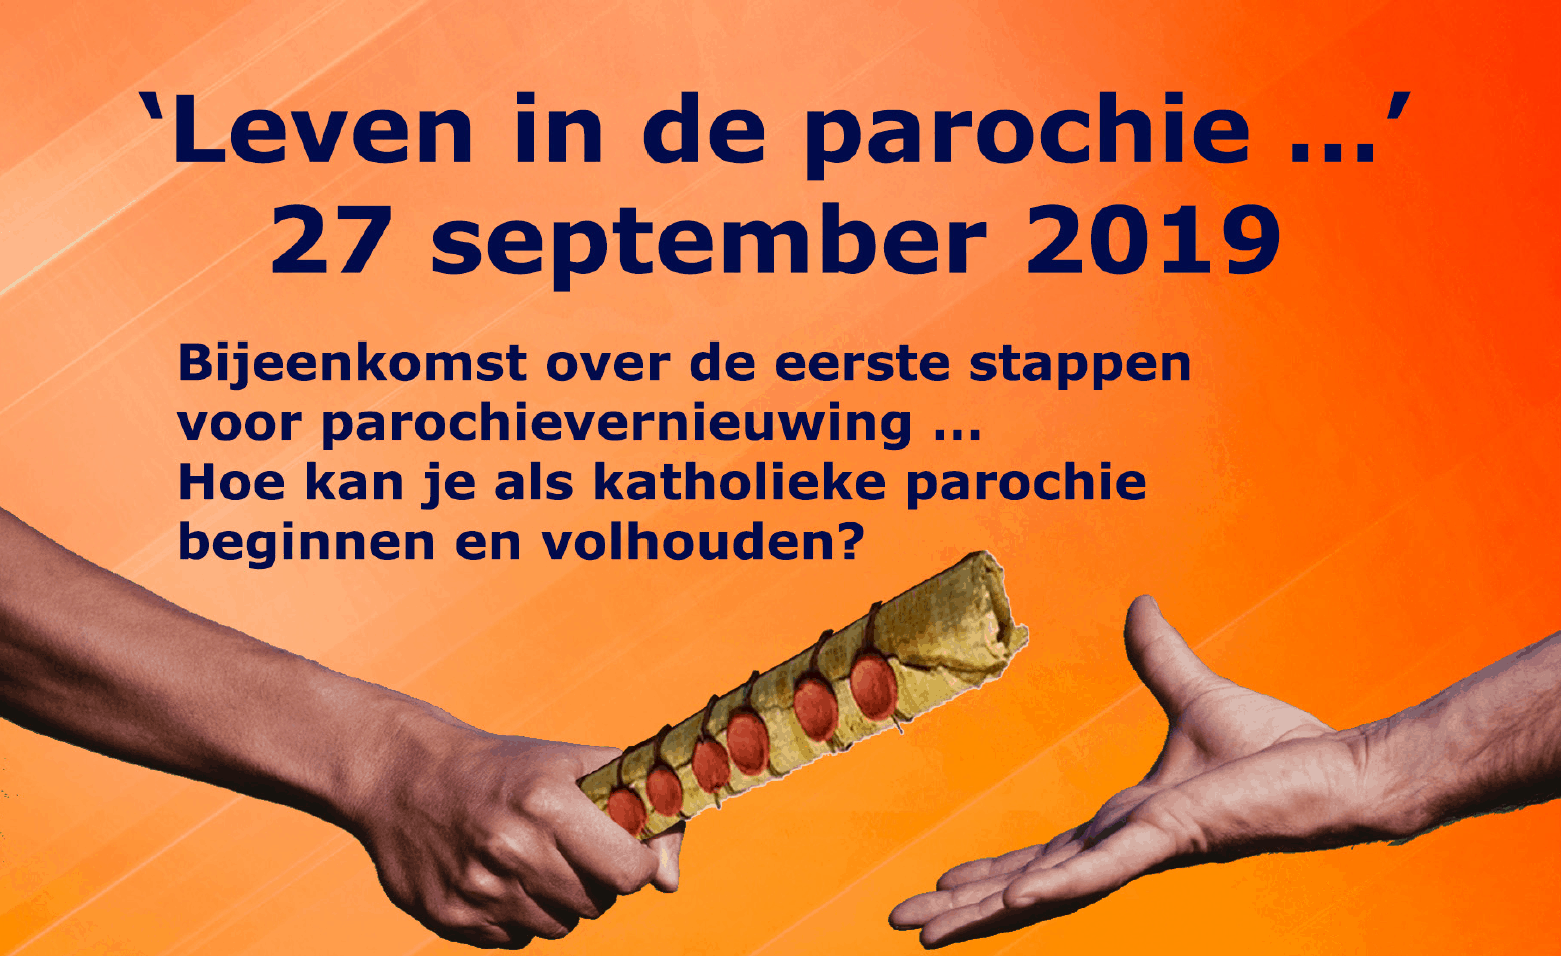 2019.09.27-leven-in-de-parochie-parochievernieuwing